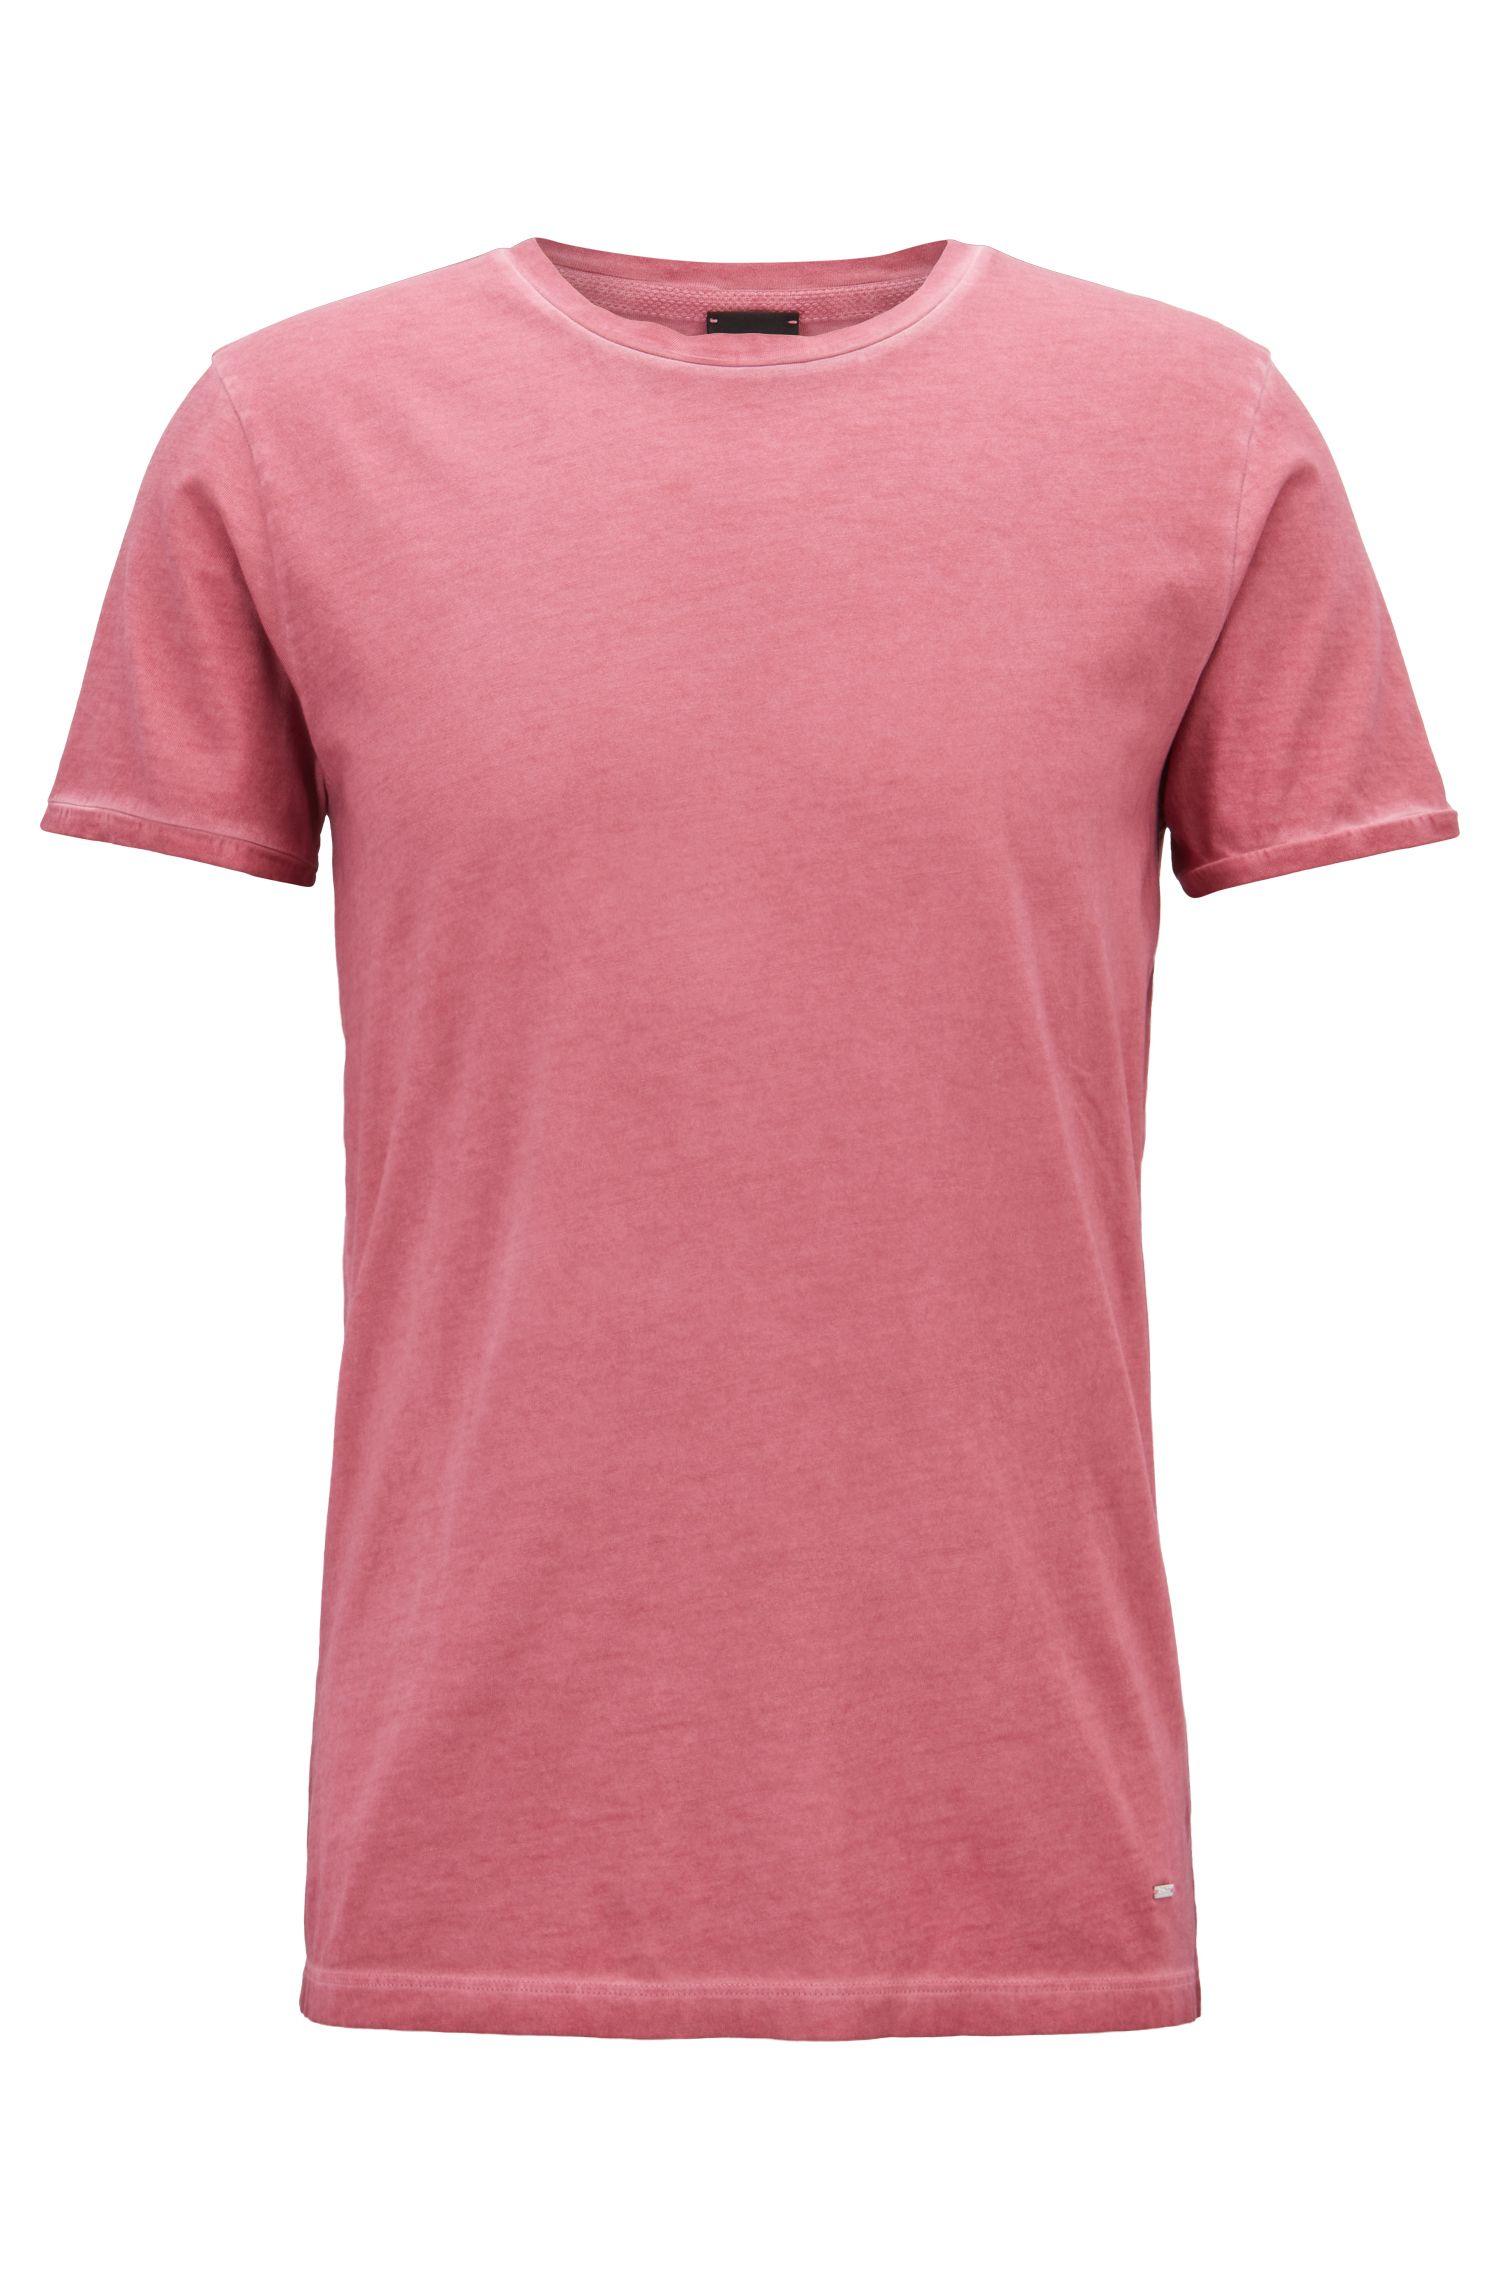 Regular-fit garment-dyed T-shirt in cotton, Open Purple